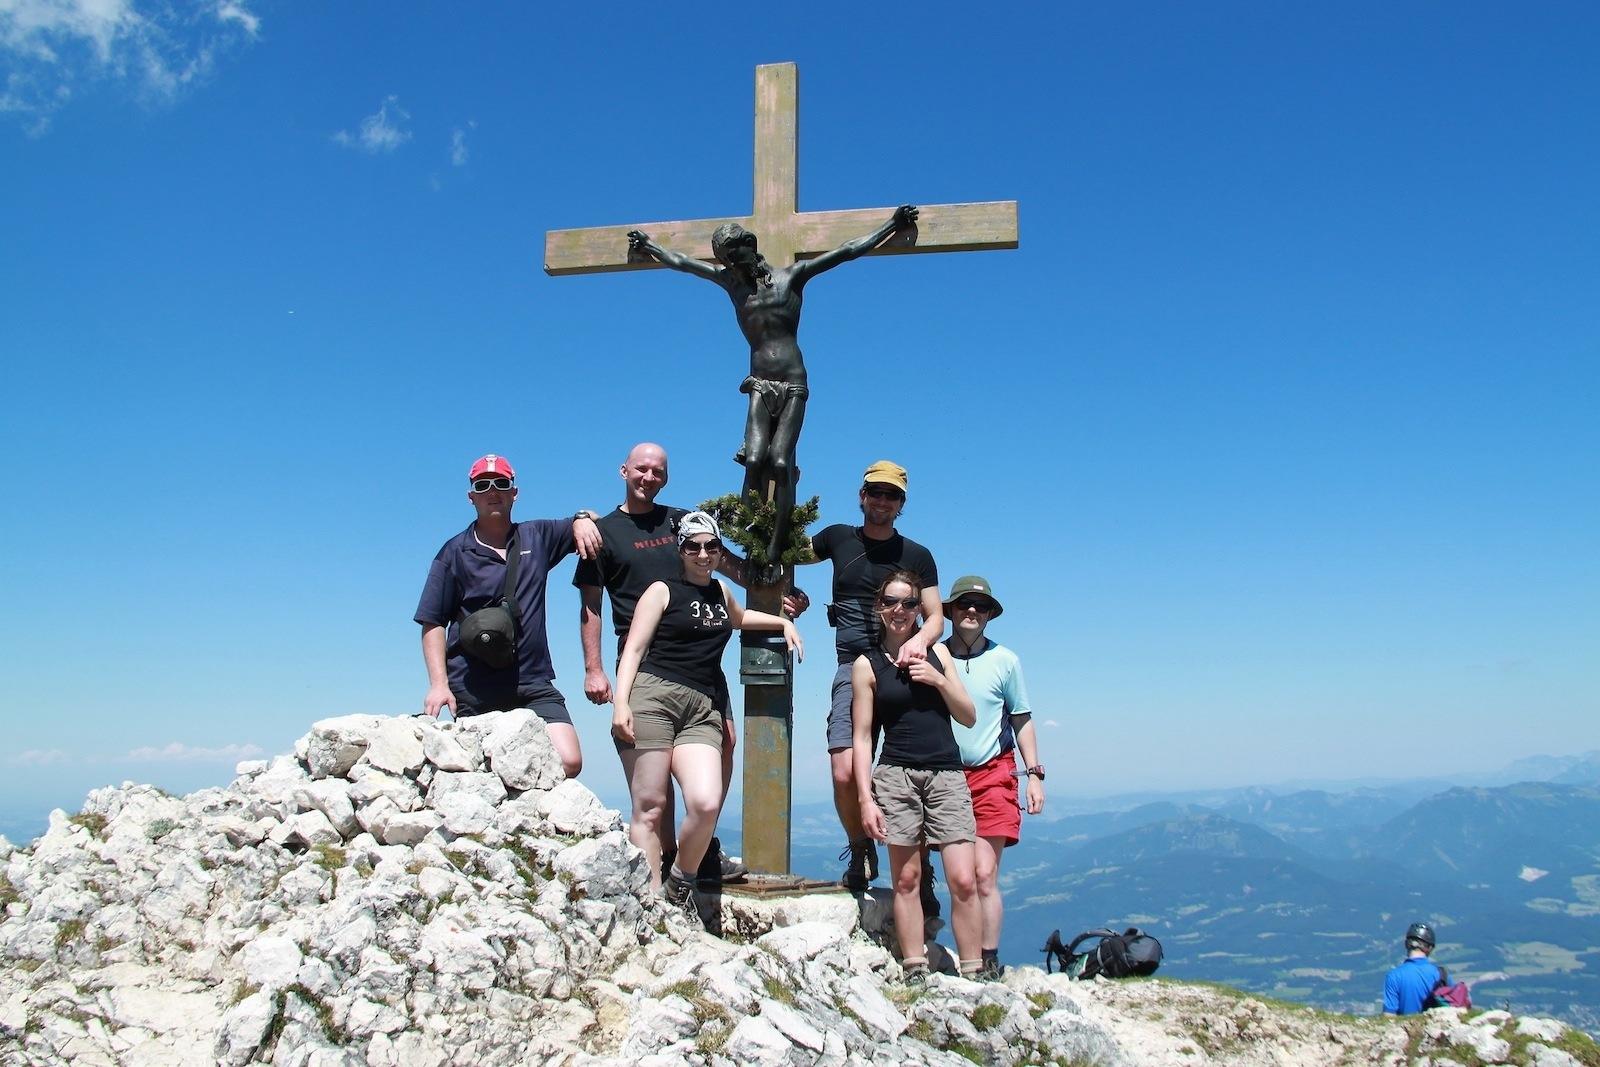 20120616 - Berchtesgadener Hochthron Lampi 155